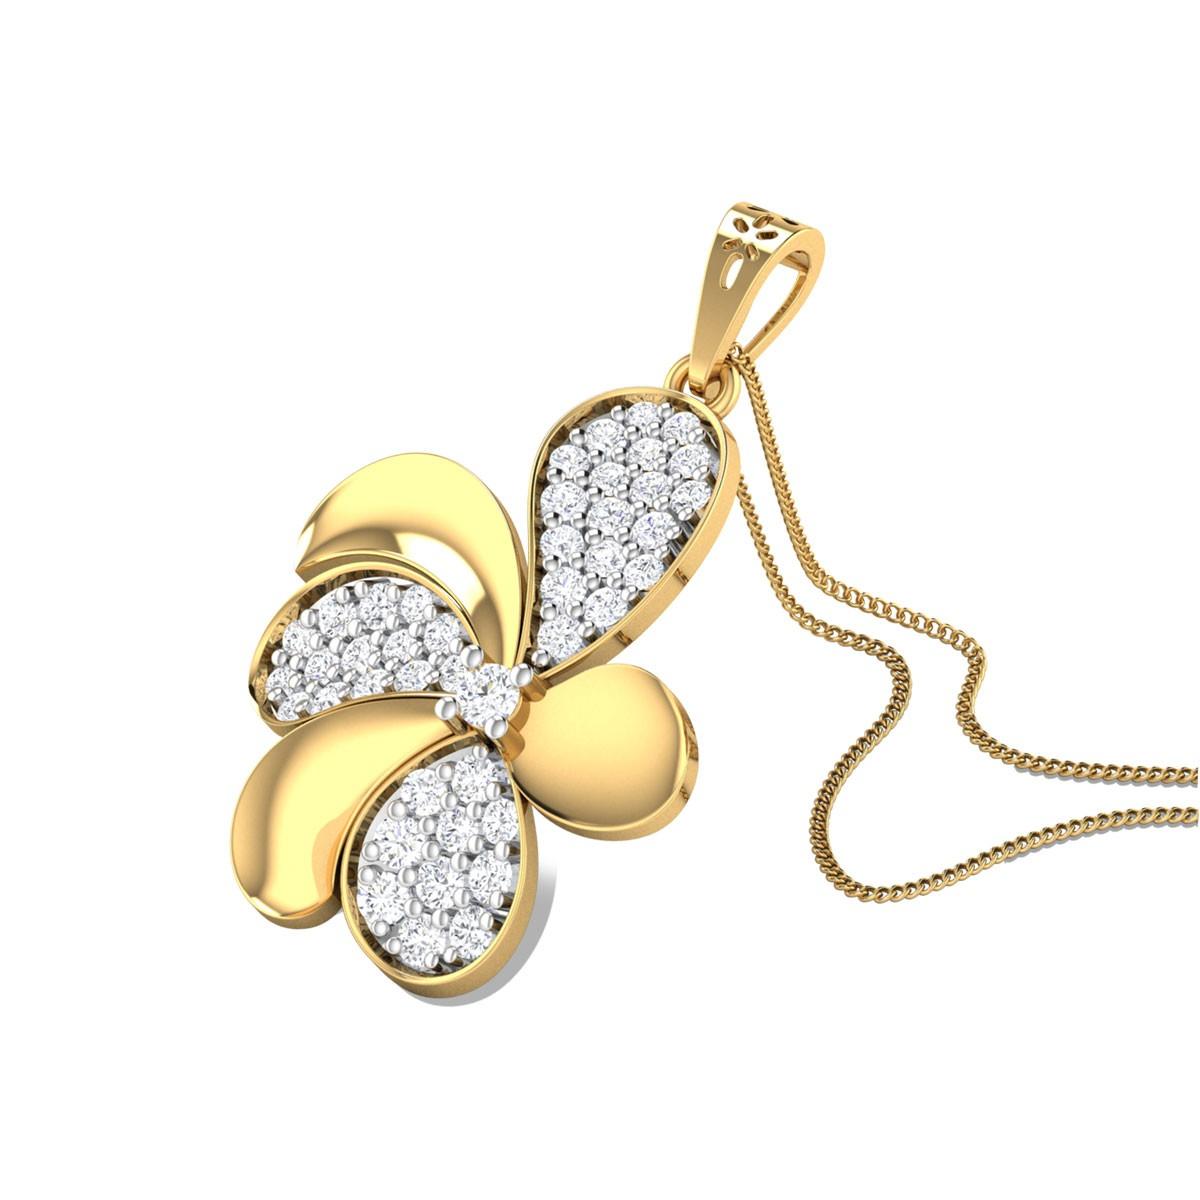 Pansy Diamond Pendant